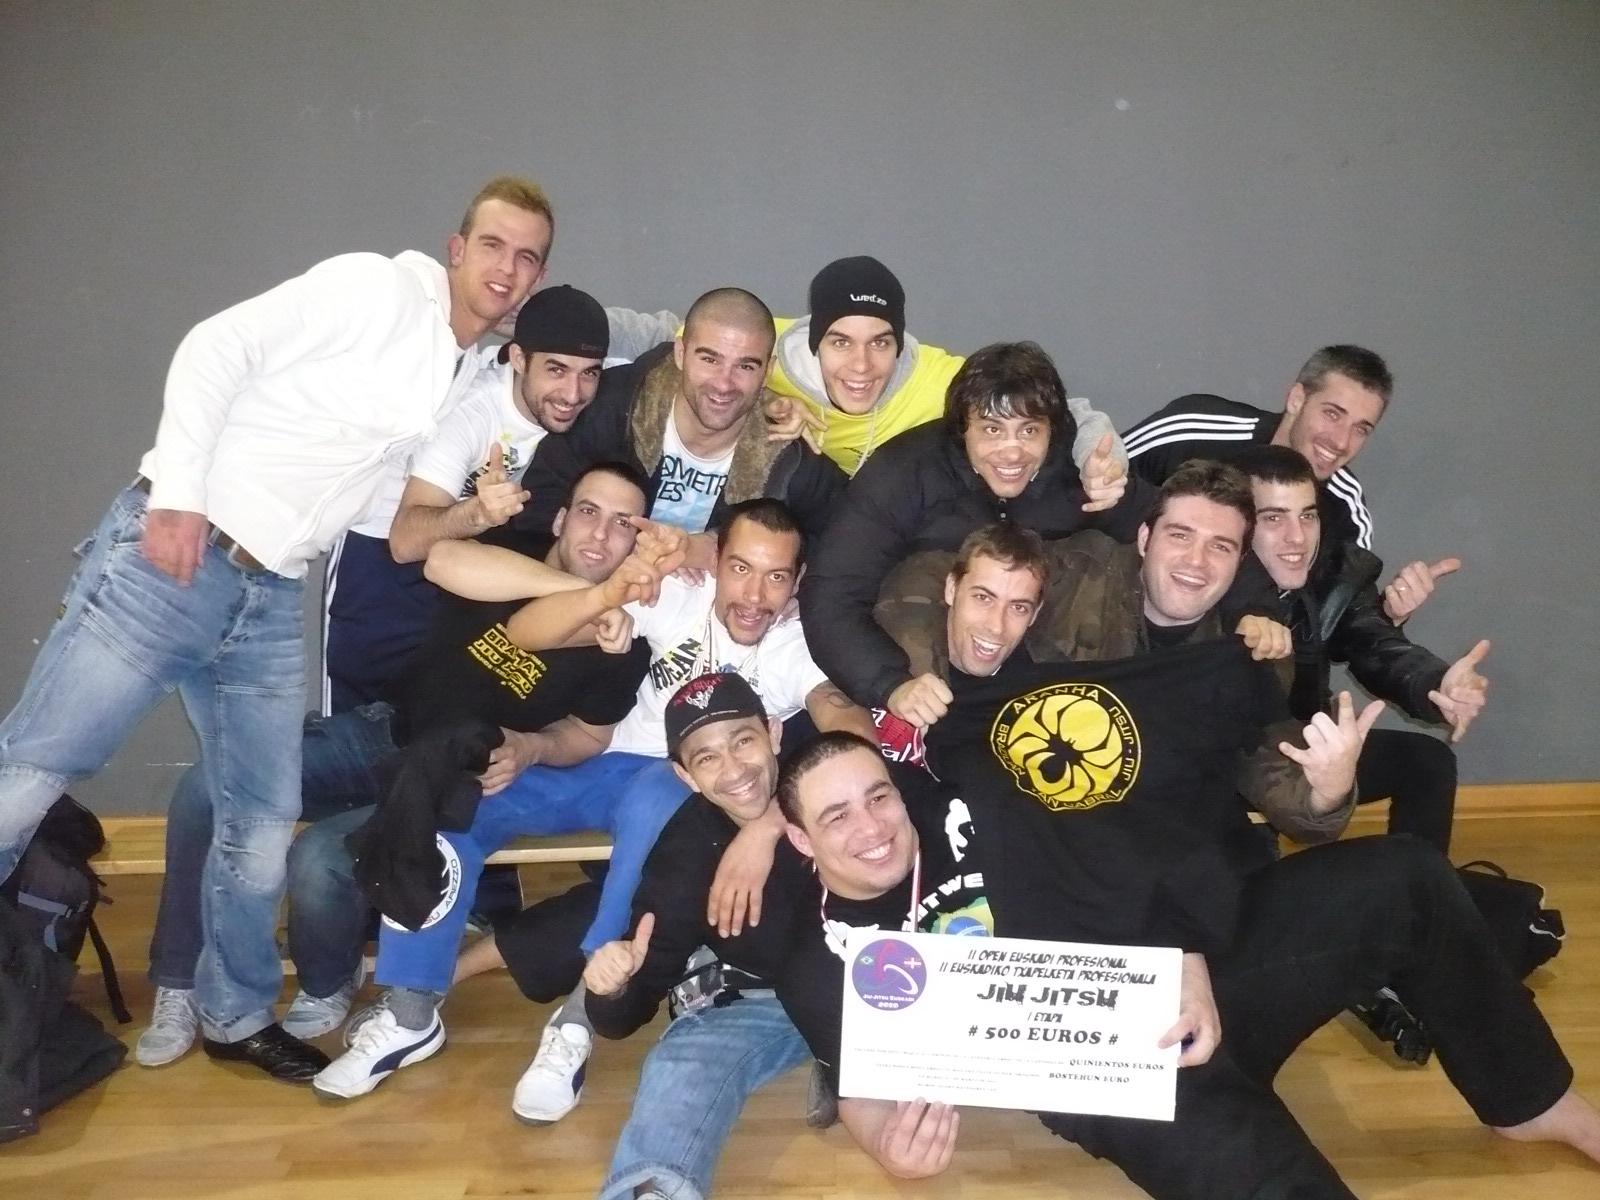 equipo bjj barcelona